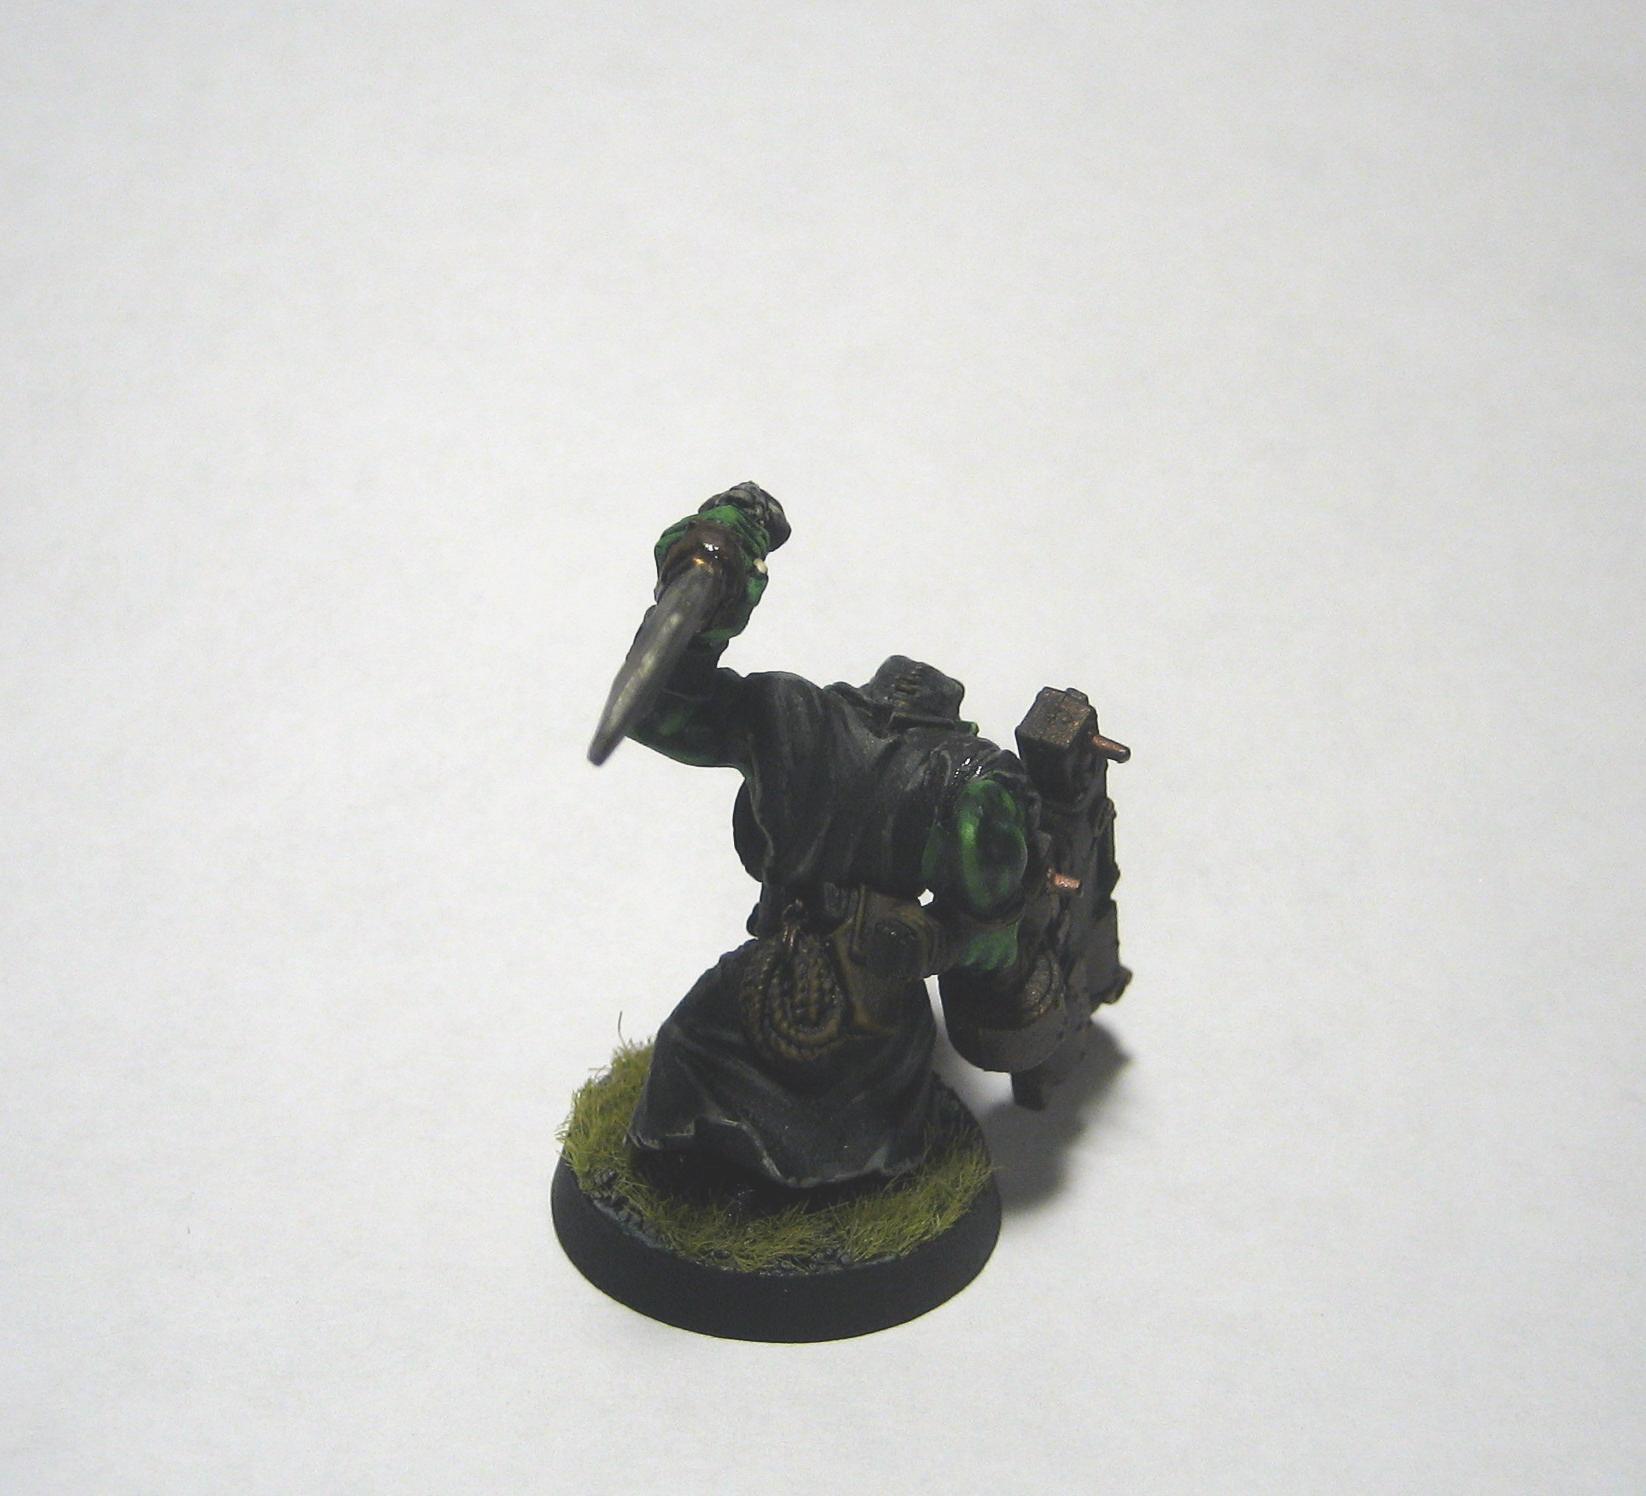 Orks, Runtherd, Slaver, Warhammer 40,000